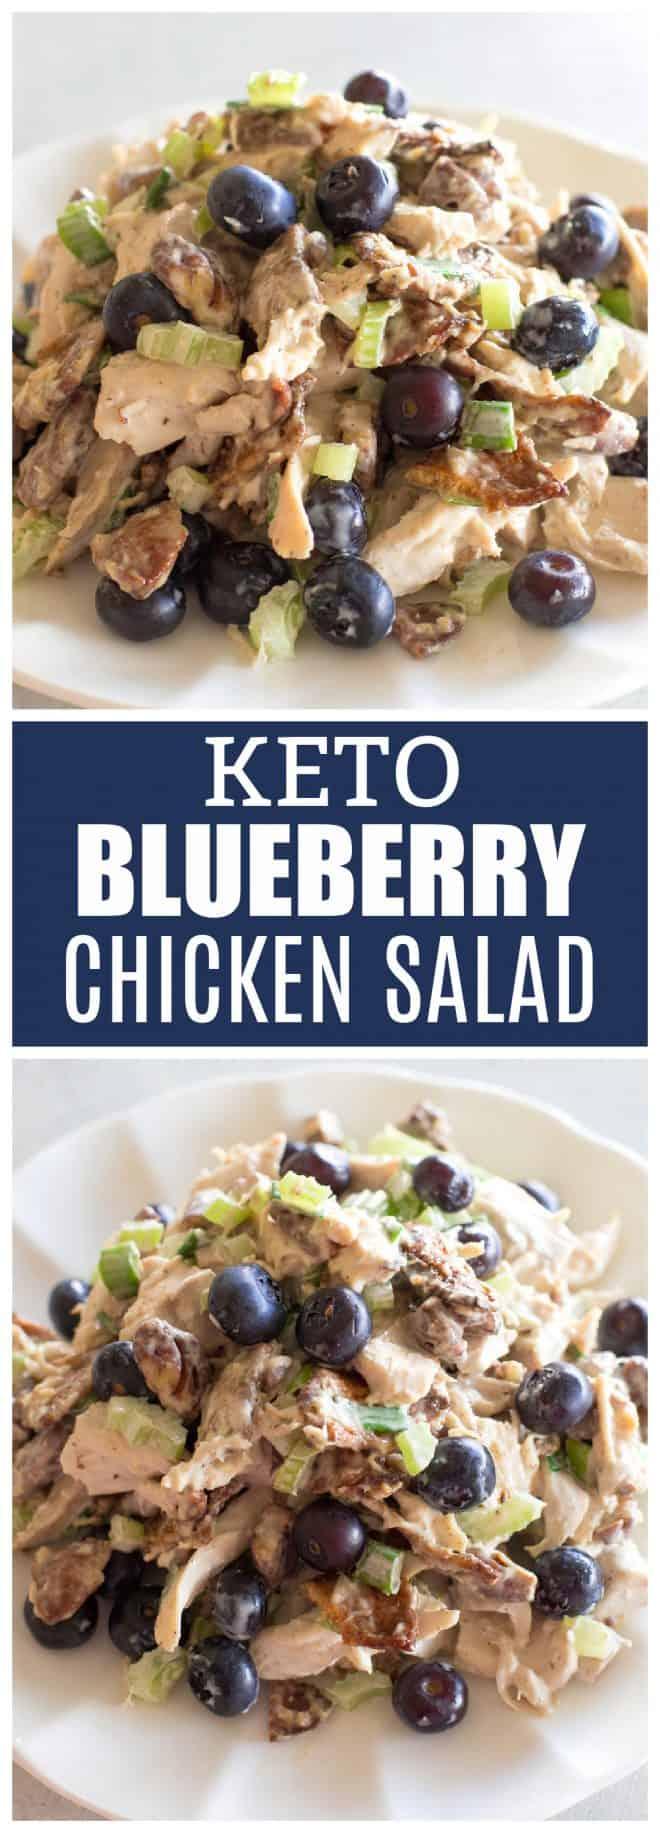 Keto Blueberry Pecan Chicken Salad